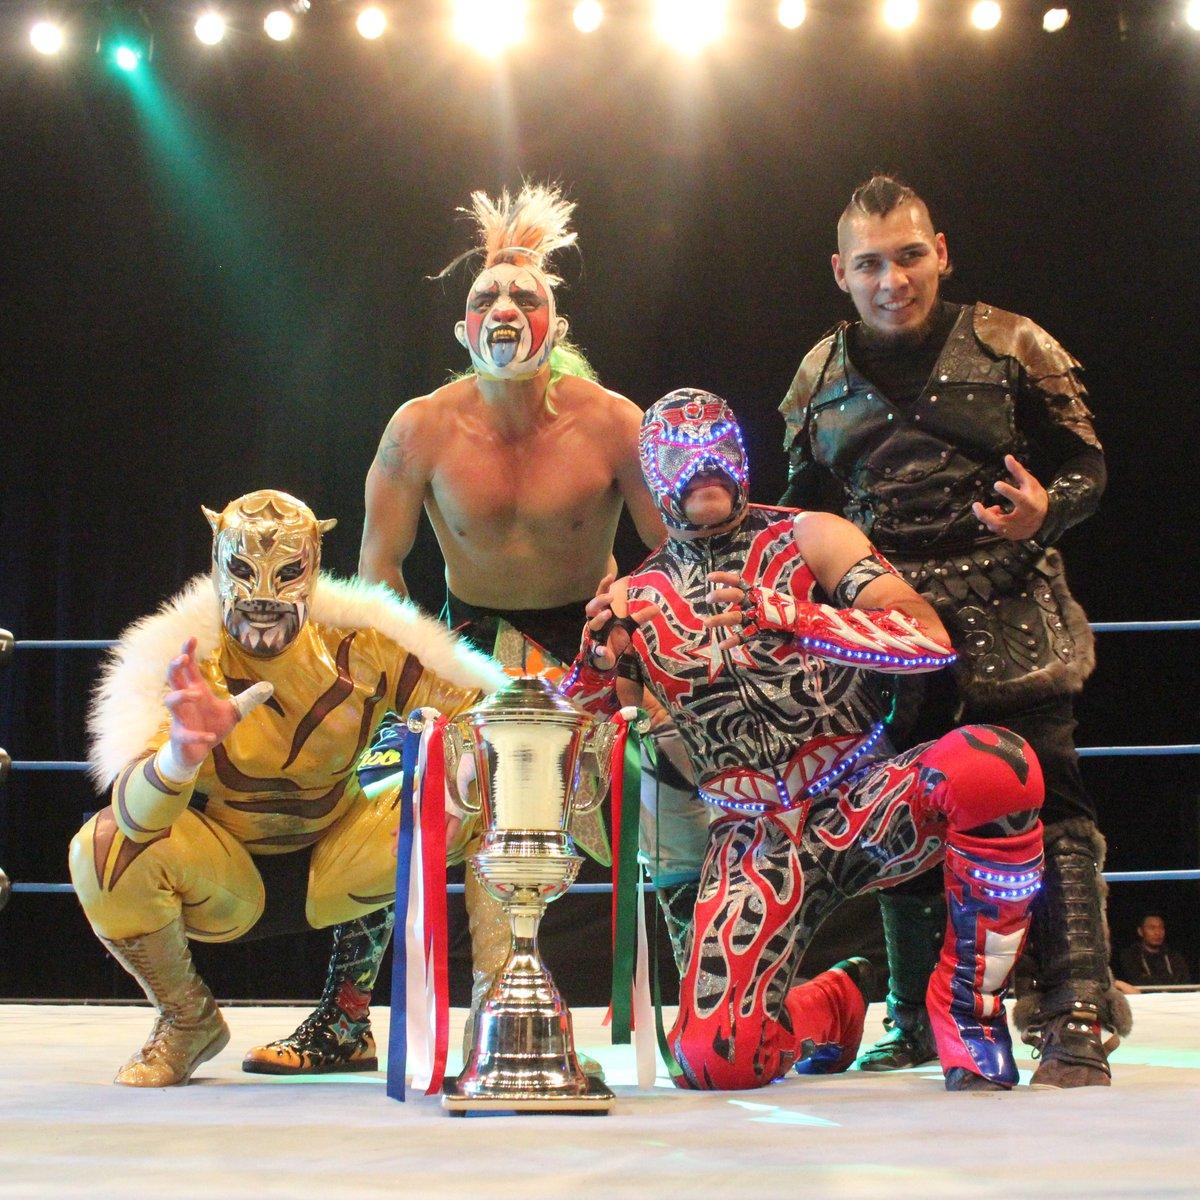 RANDOM BUNDLE Custom Wrestling WWE//AEW//WWF//IMPACT//NJPW//ROH Figure Belts